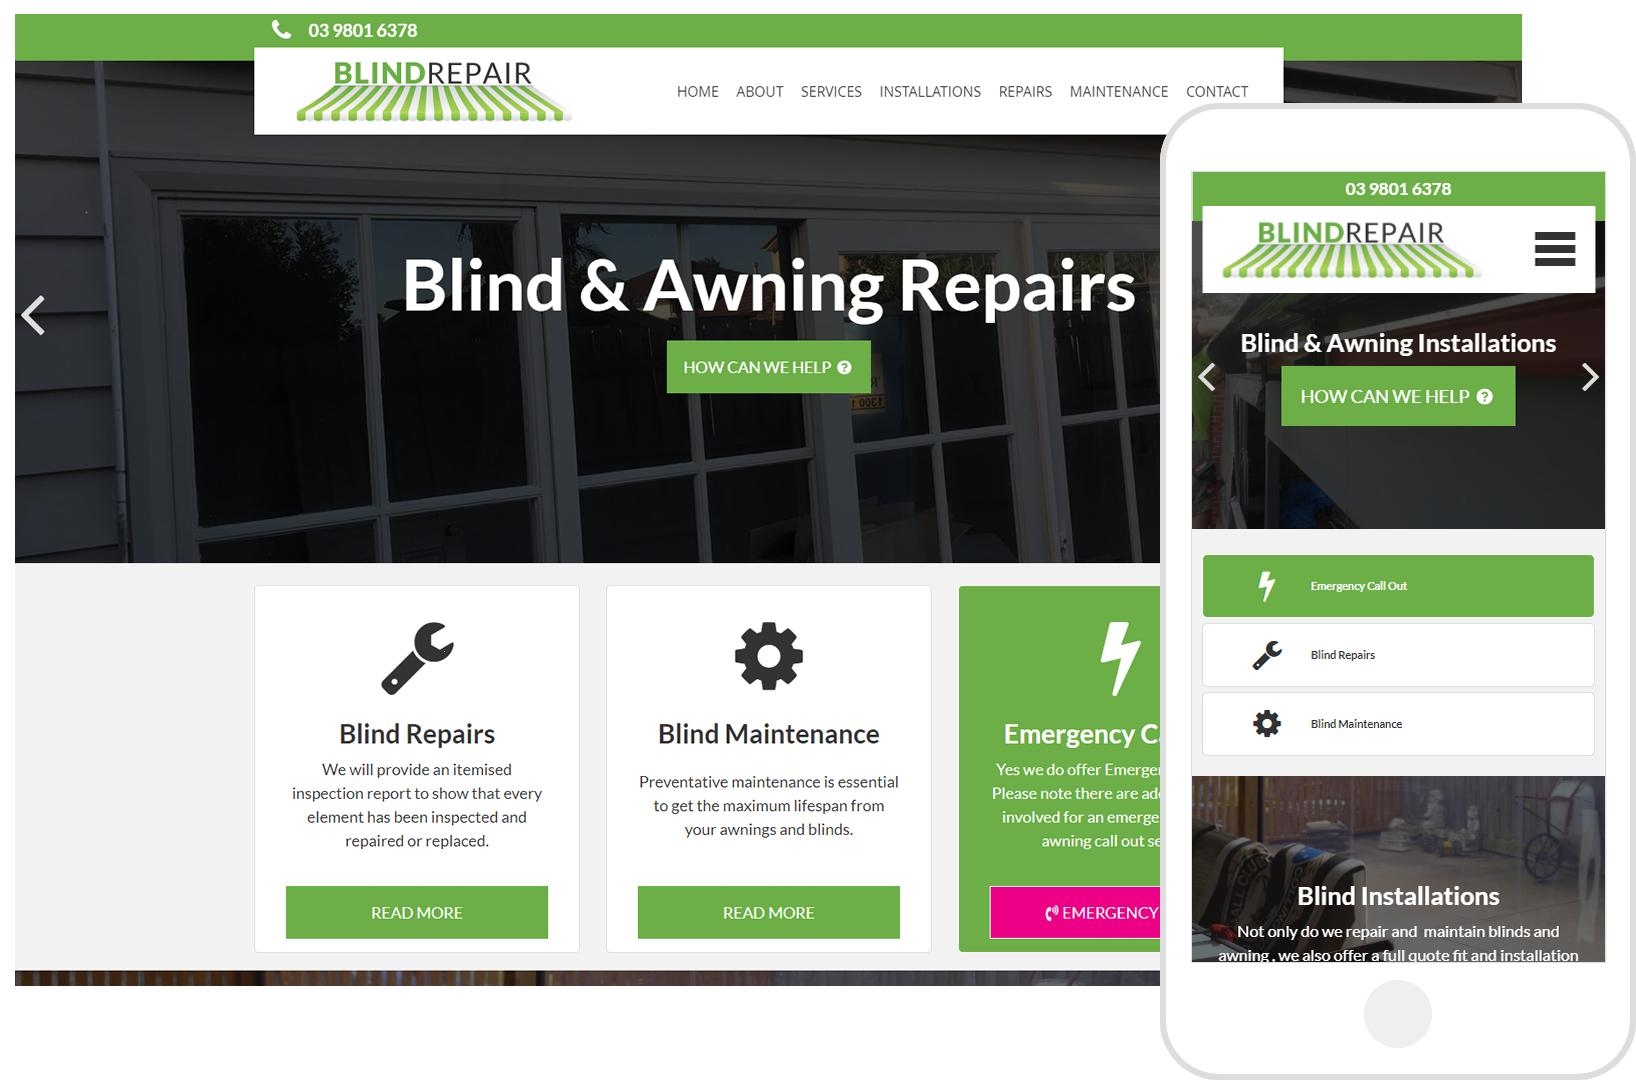 Blind & Awning Repairs